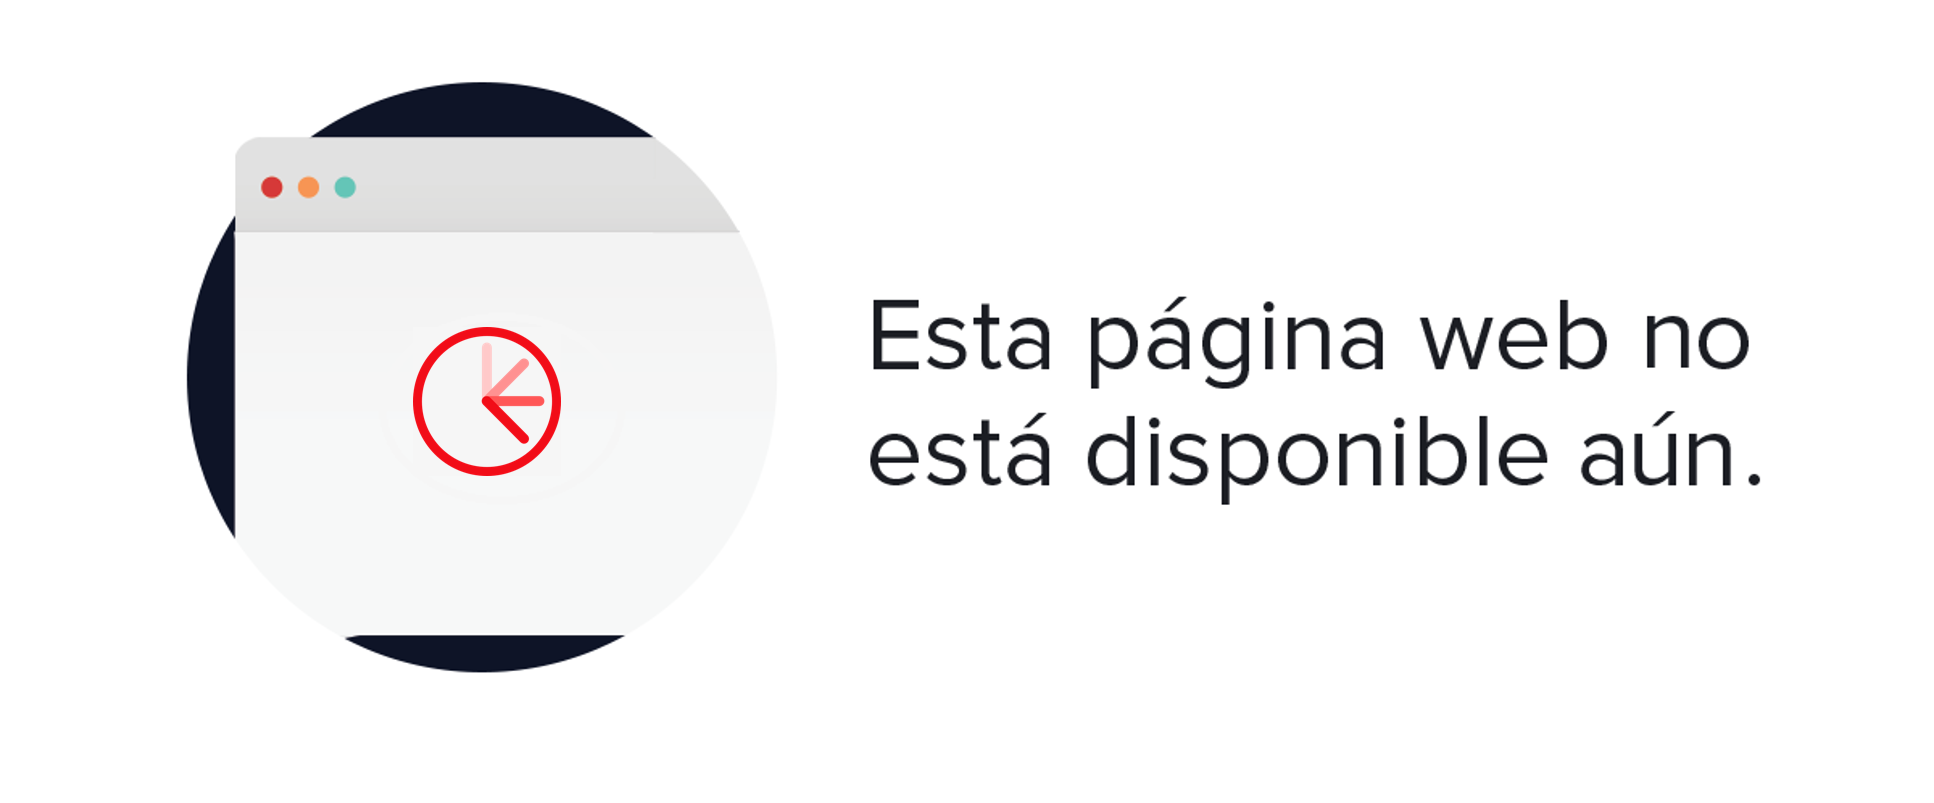 promotions Adidas Zx Flux W Calzado gris outlet stylefile online Slap-up  el-negro CGIKMST127